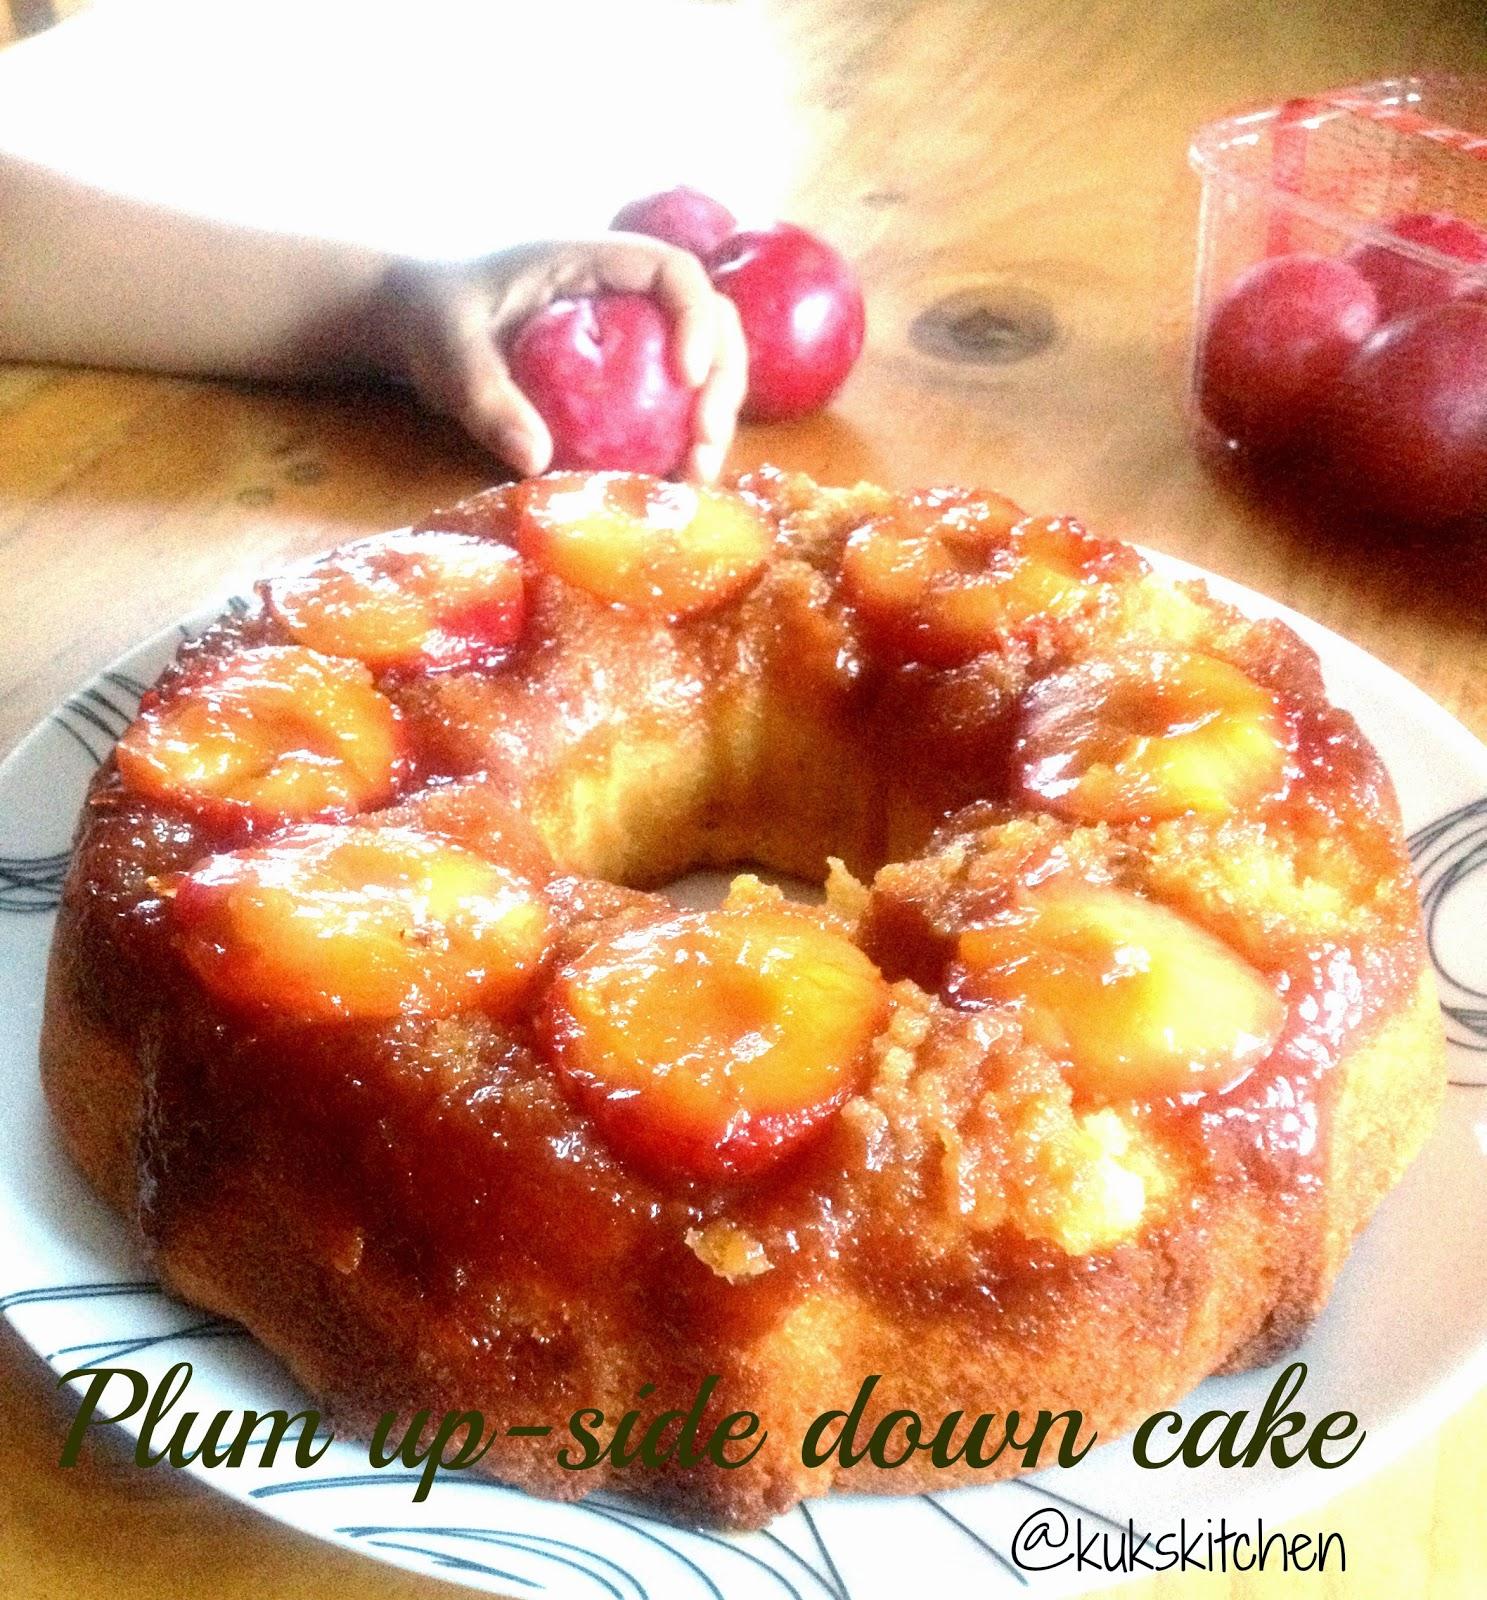 plum cake tatin kukskitchen ina garten barefoot contessa plum upside down cake